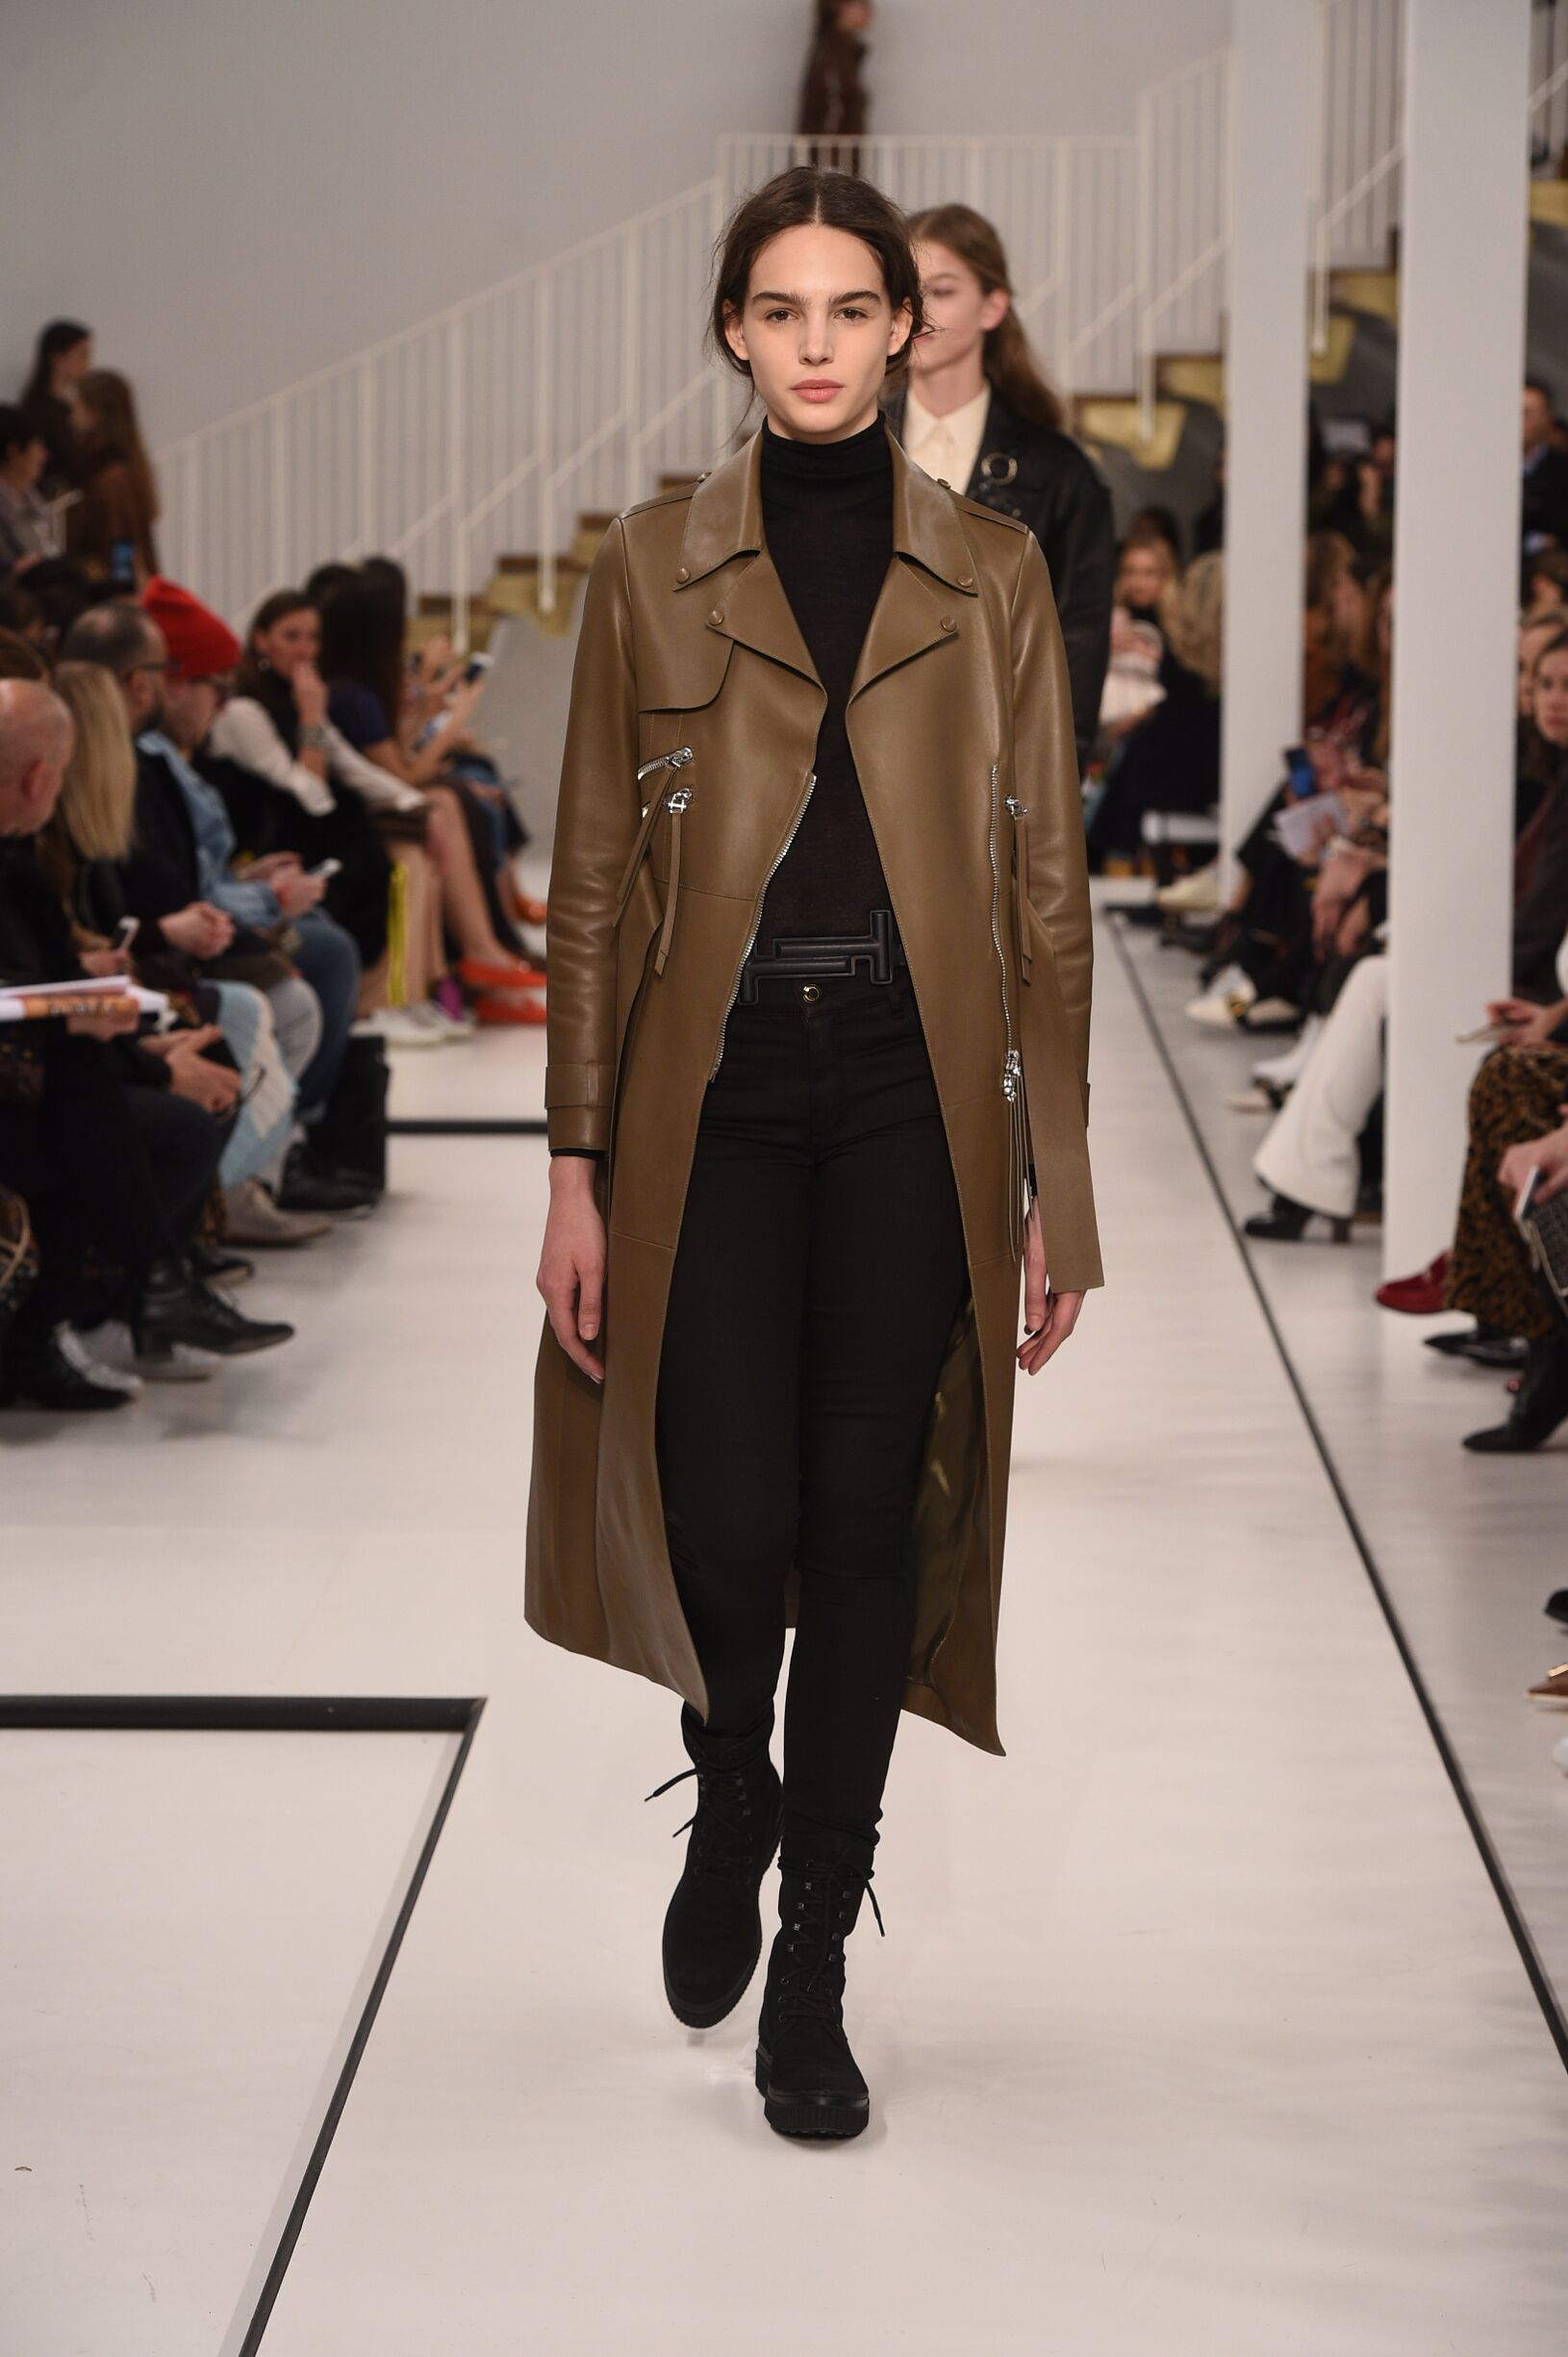 Fashion Woman Model Tod's Catwalk 17-18